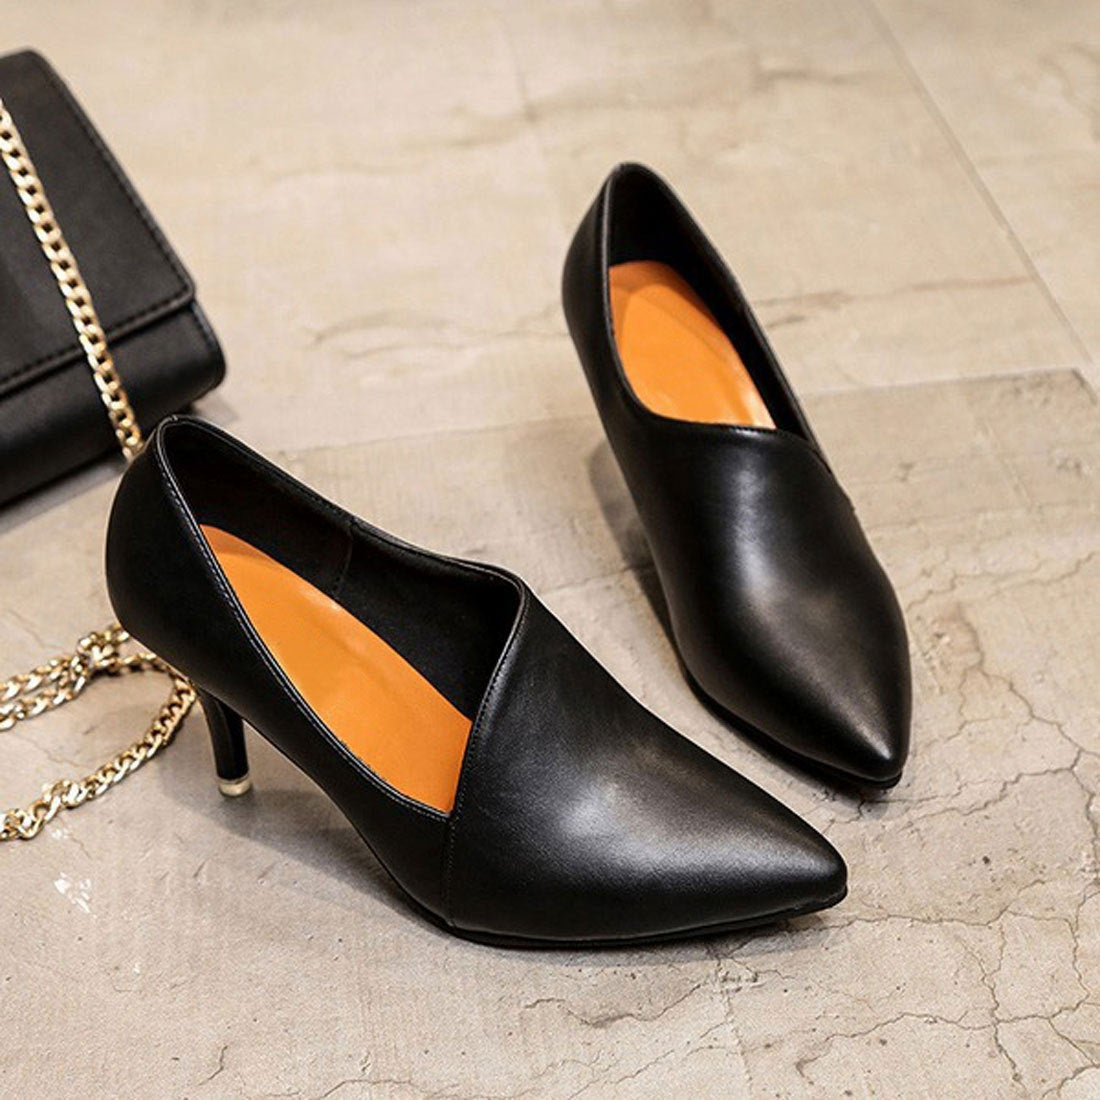 5b499ba08aefb チュクラ chuclla アシンメトリーカット レザー調 パンプス (ブラック(レザー)) -靴&ファッション通販 ロコンド〜自宅で試着、気軽に返品